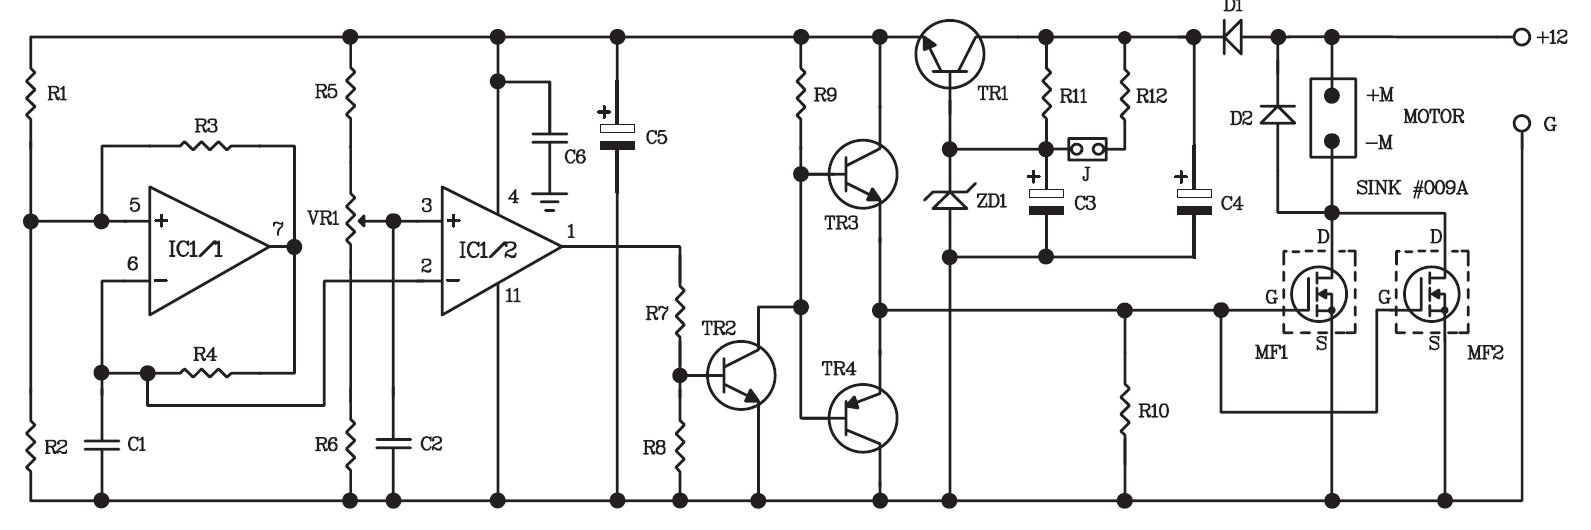 mx066 pwm for hho wiring diagram data wiring diagram